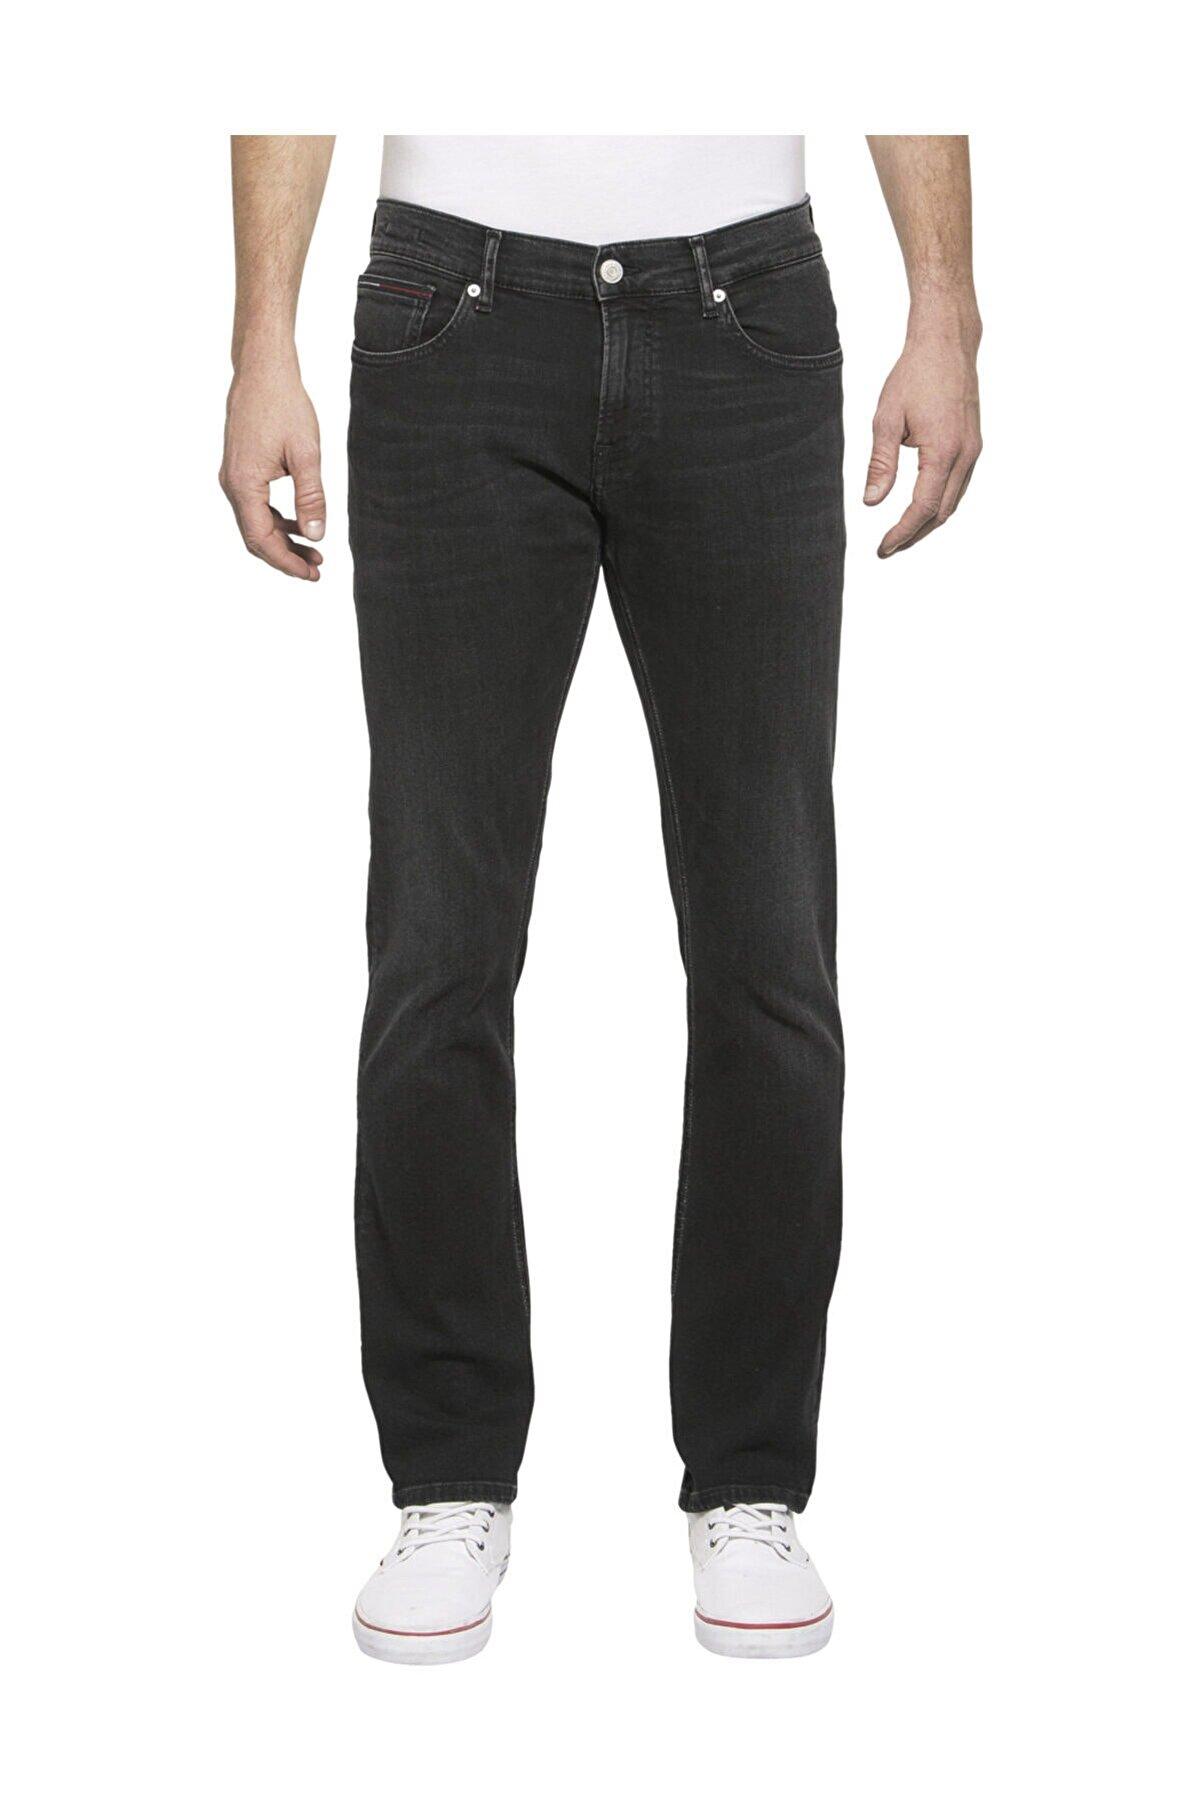 Tommy Hilfiger Erkek Jeans DM0DM06392